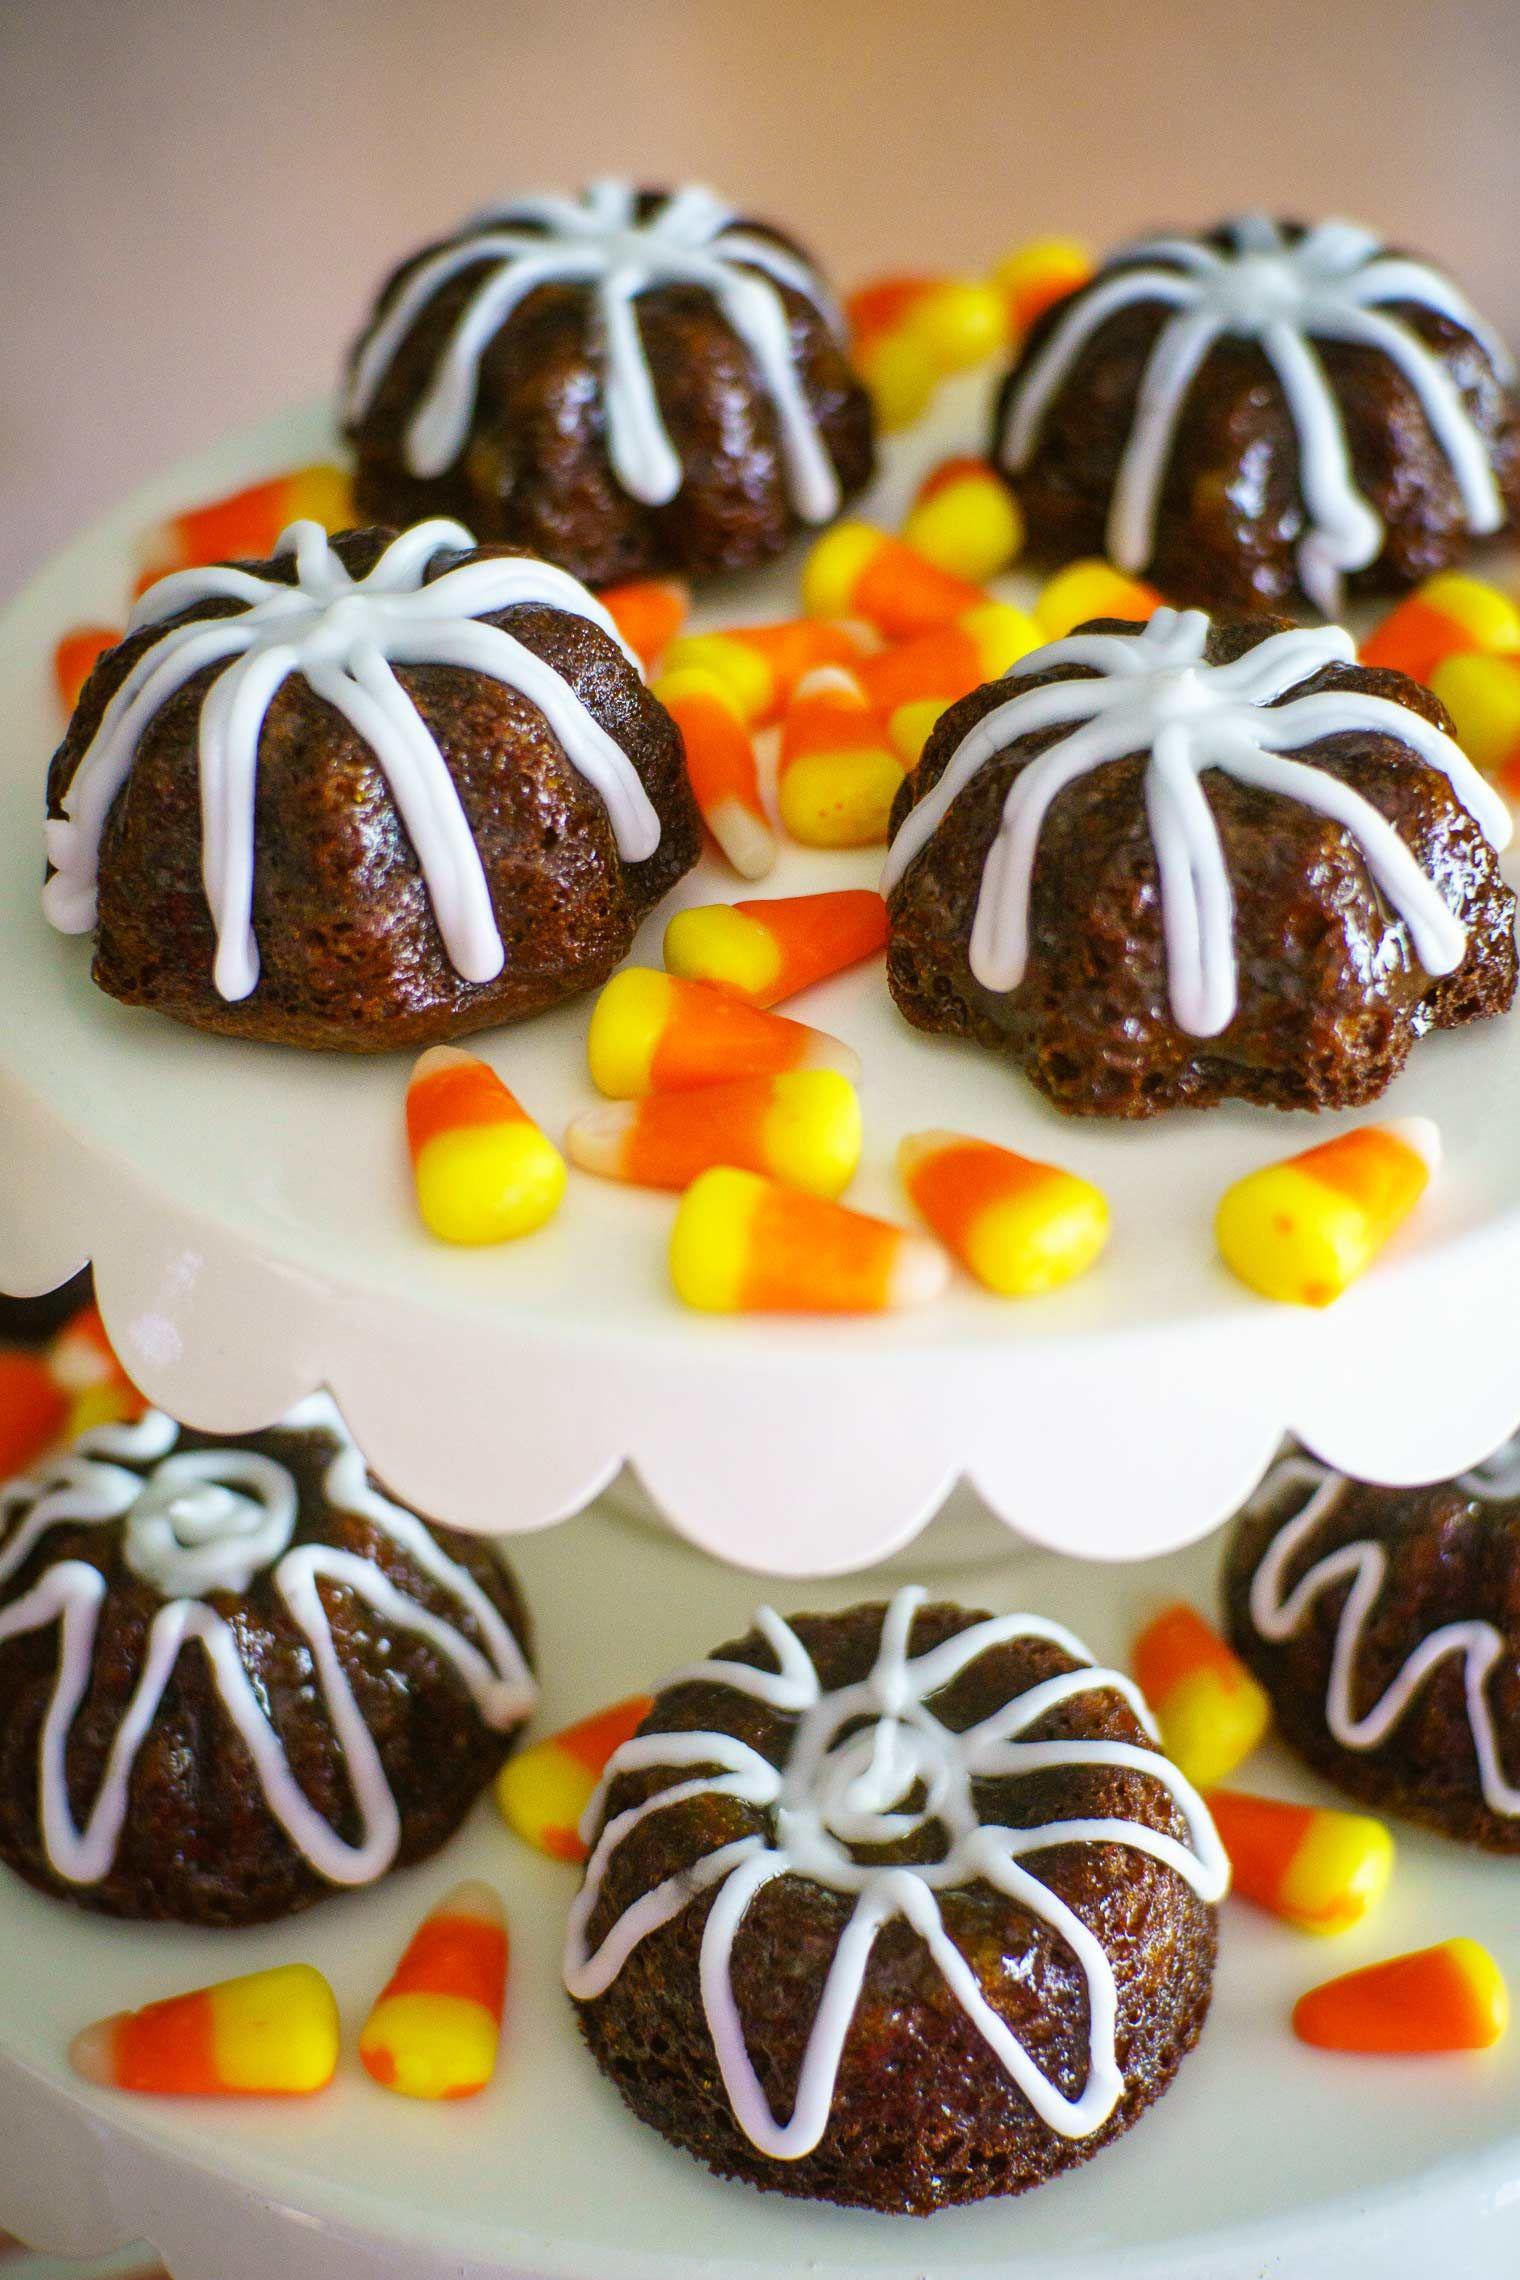 Gingerbread mini bundt cakes recipe cake gingerbread